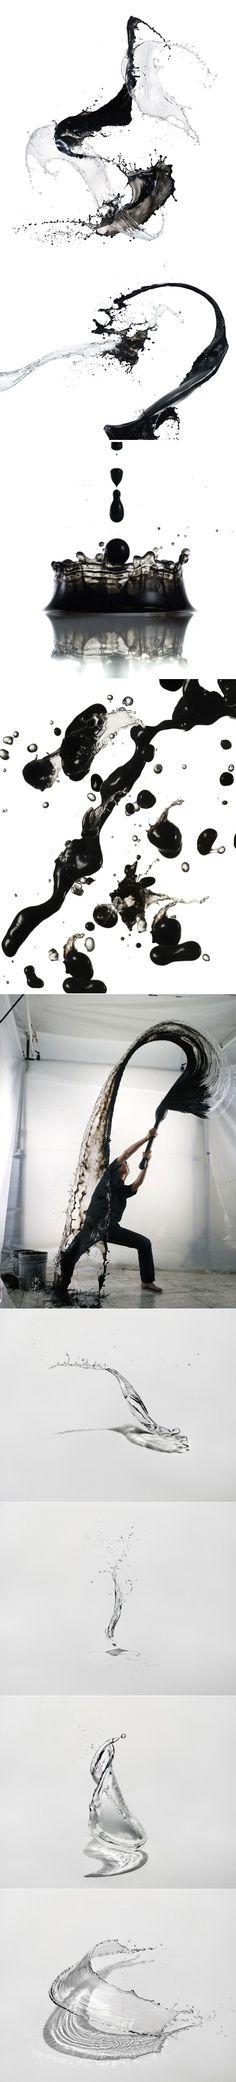 Shinichi Maruyama présente Water Sculptures et Kusho - Journal du Design Water Sculpture, Ink In Water, Web Design, Graphic Design, Shape Design, Doja Cat, Art Abstrait, Ink Painting, Art Plastique